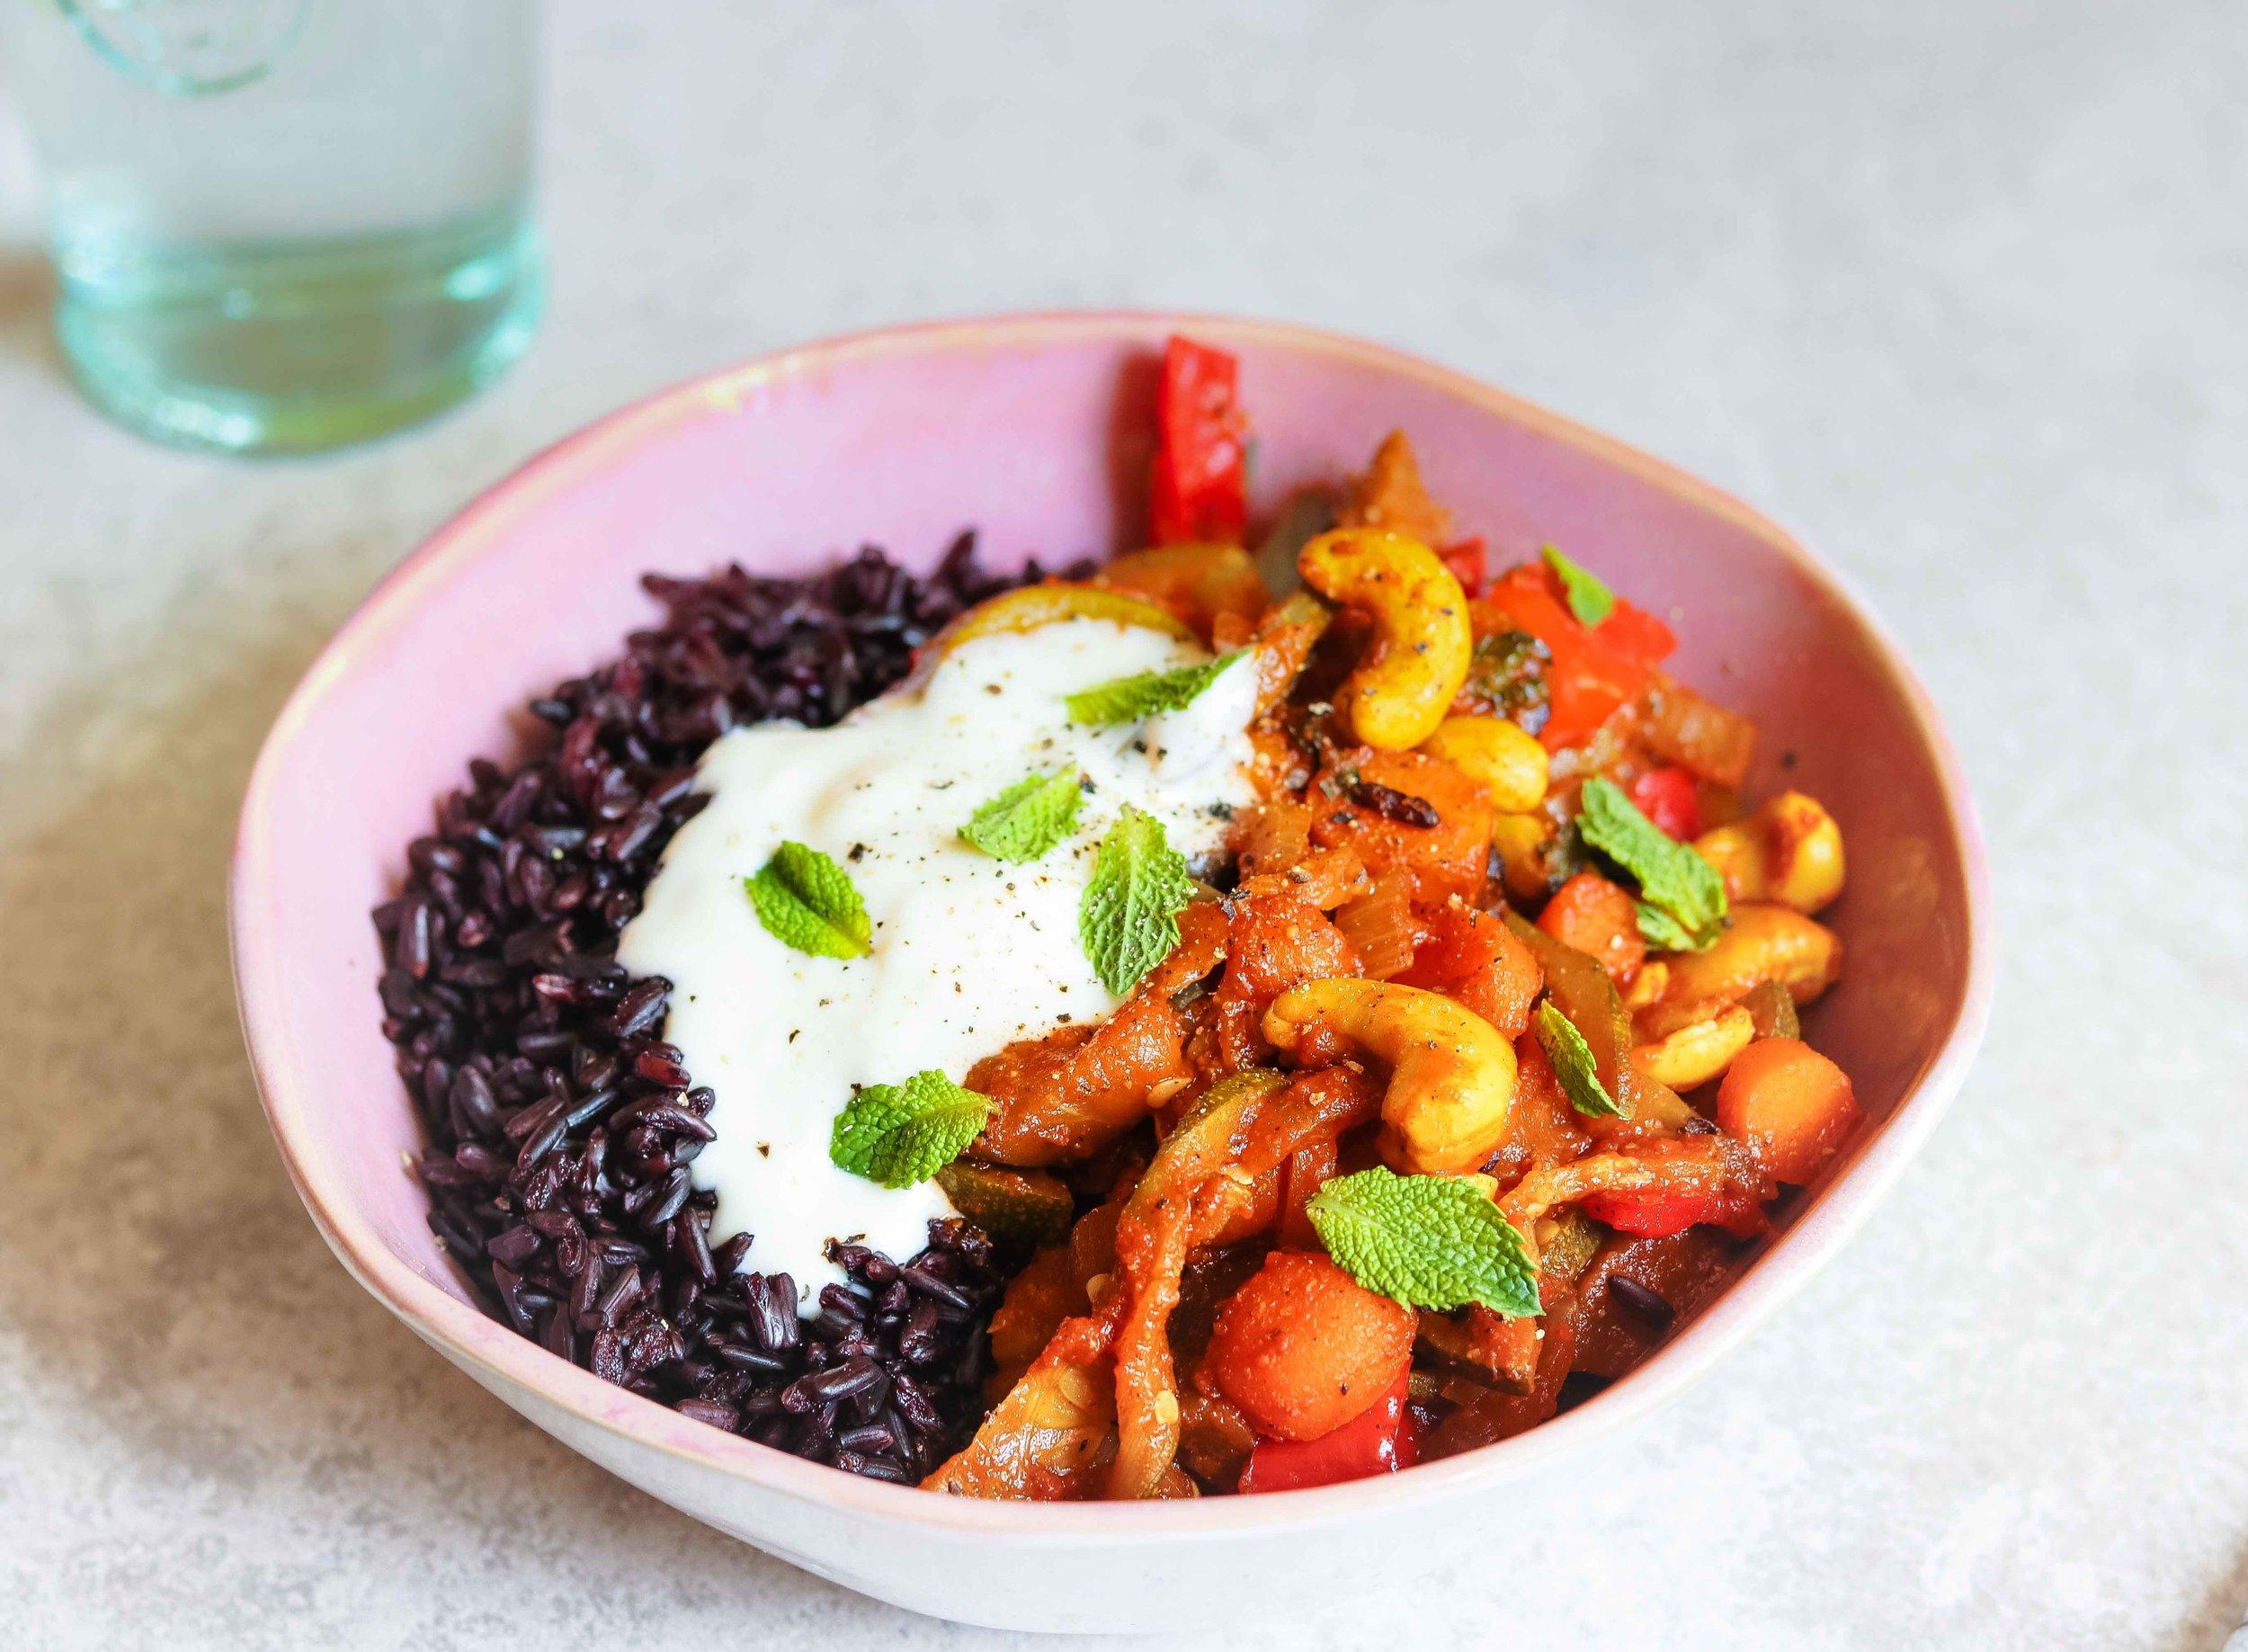 maroccan-veg-black-rice-cashews-3.jpg